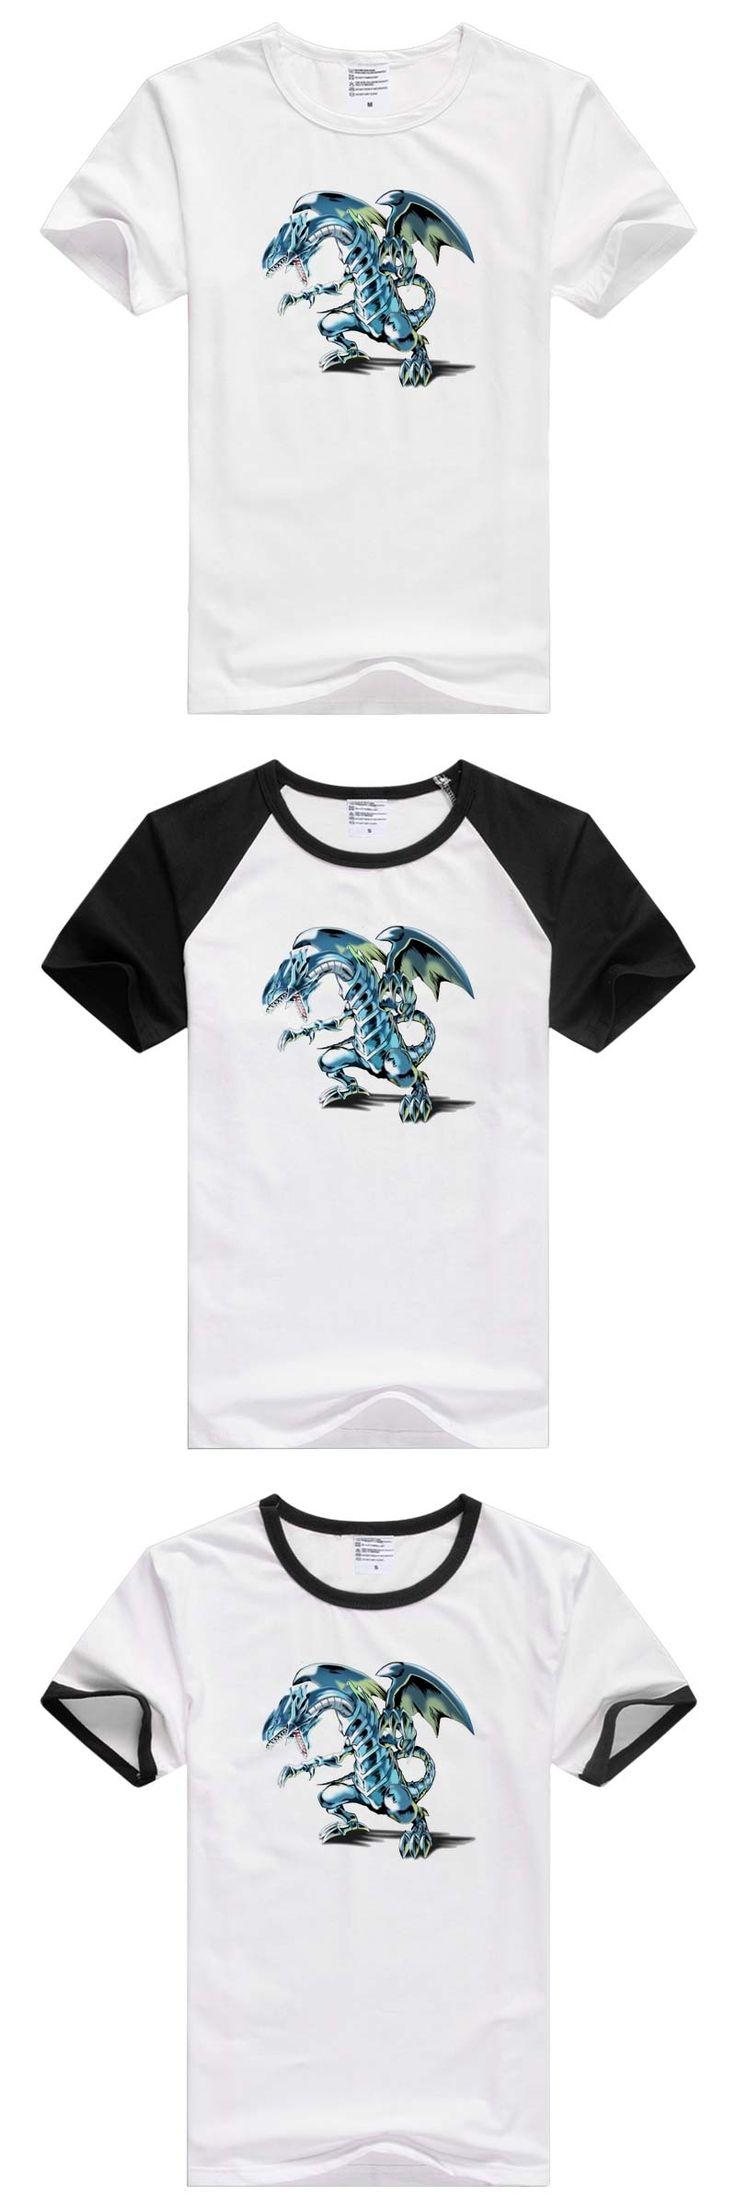 Blue-Eyes White Dragon Duel Monsters YuGiOh Game Anime short sleeve casual Men/Women T-shirt Tshirt Cool Print tee GA376